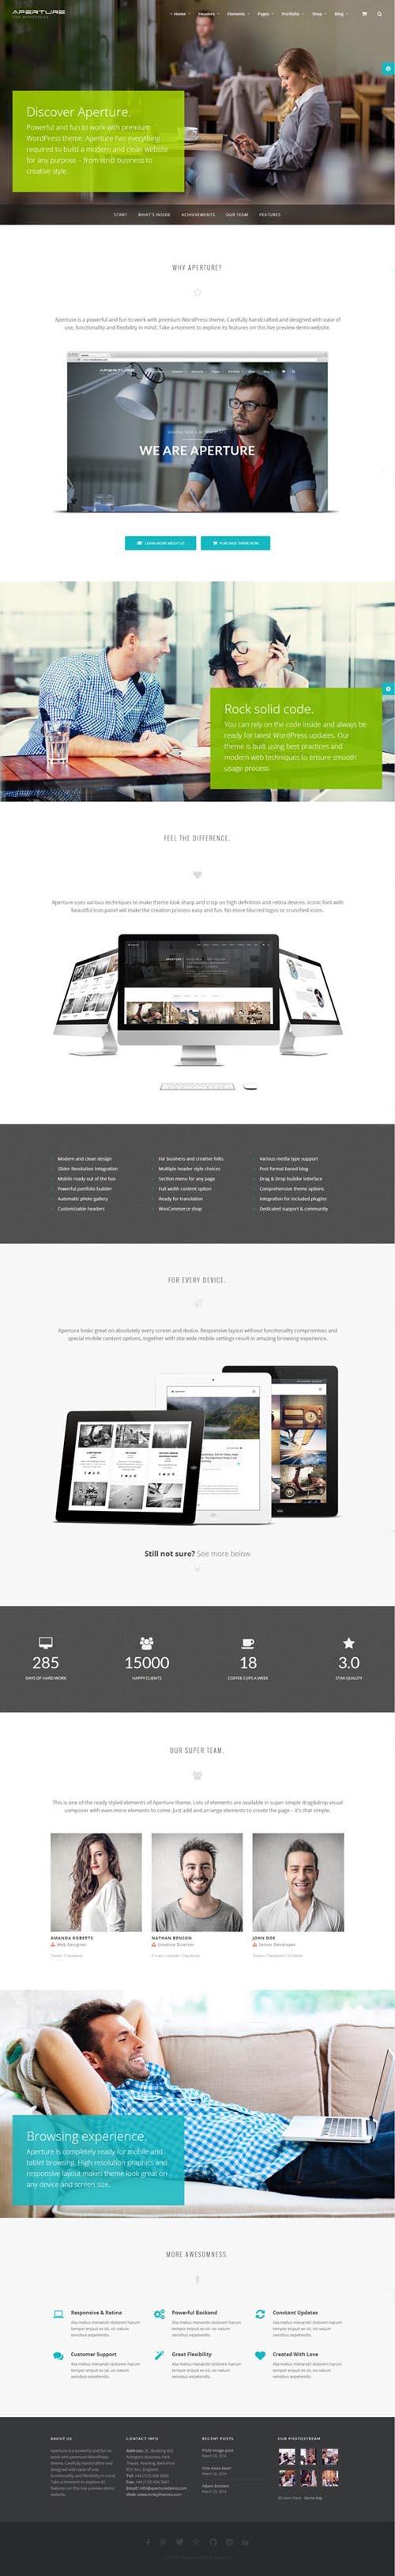 Aperture - Full Featured WordPress Theme